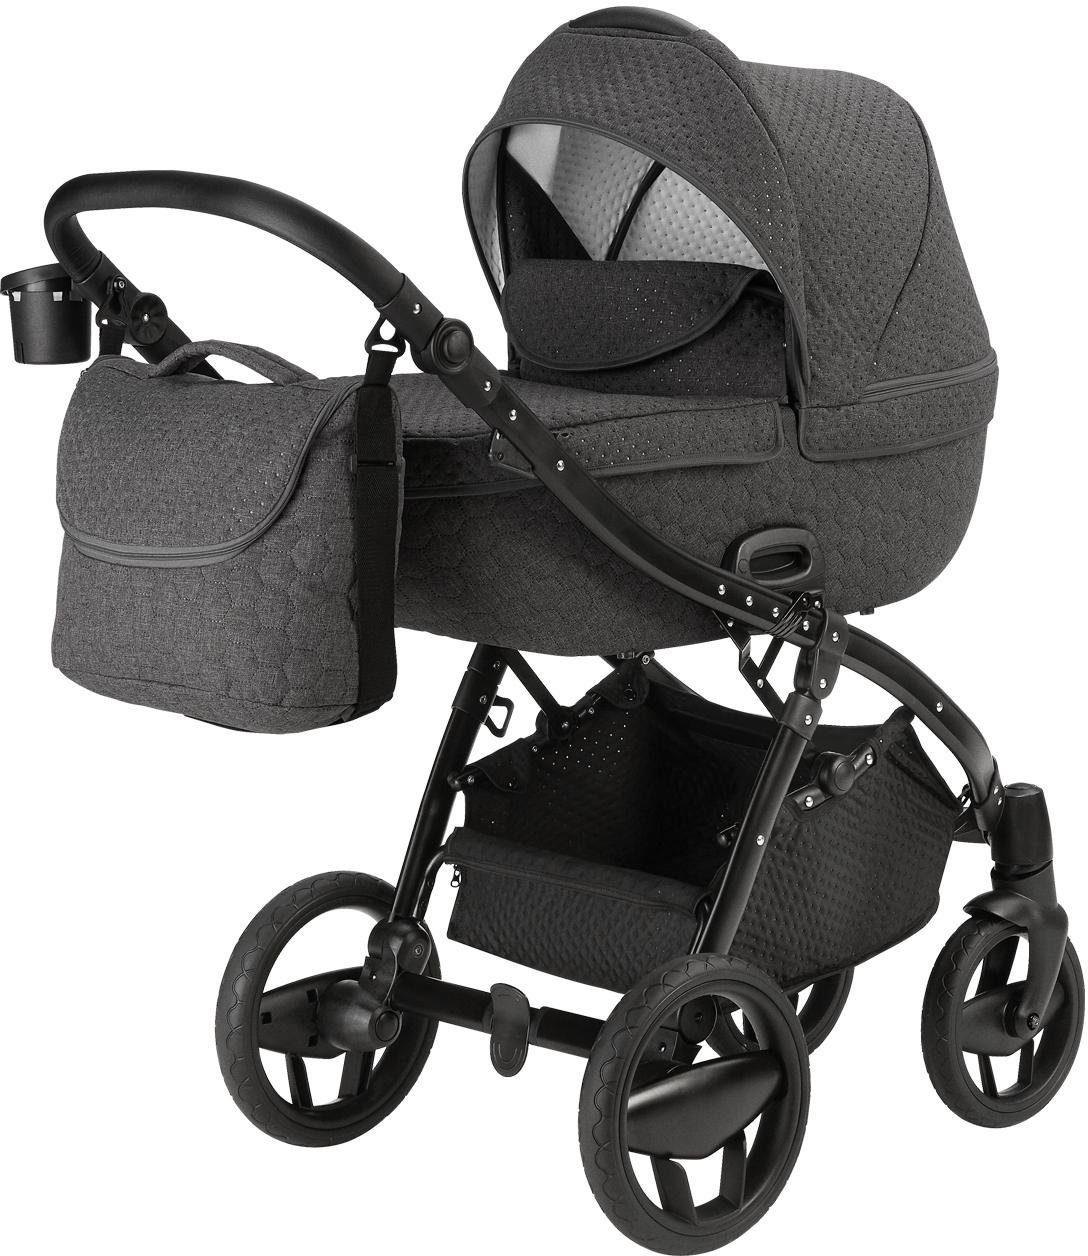 knorr-baby Kombi-Kinderwagen Set, »Piquetto, grau«